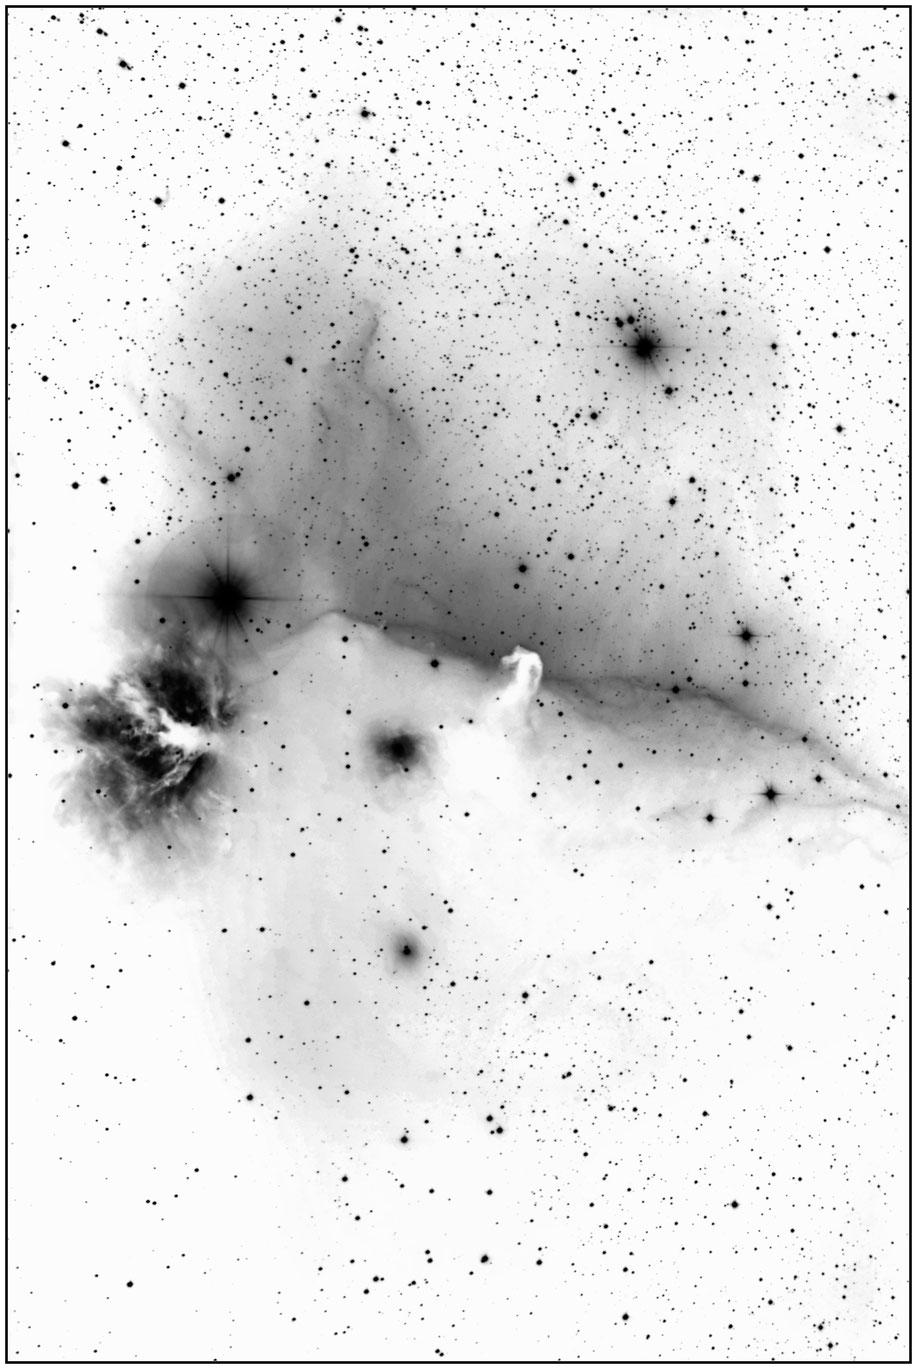 IC 434 • LBN 954, Sh-2 277  - Invertierte Aufnahme - MeixnerObservatorium